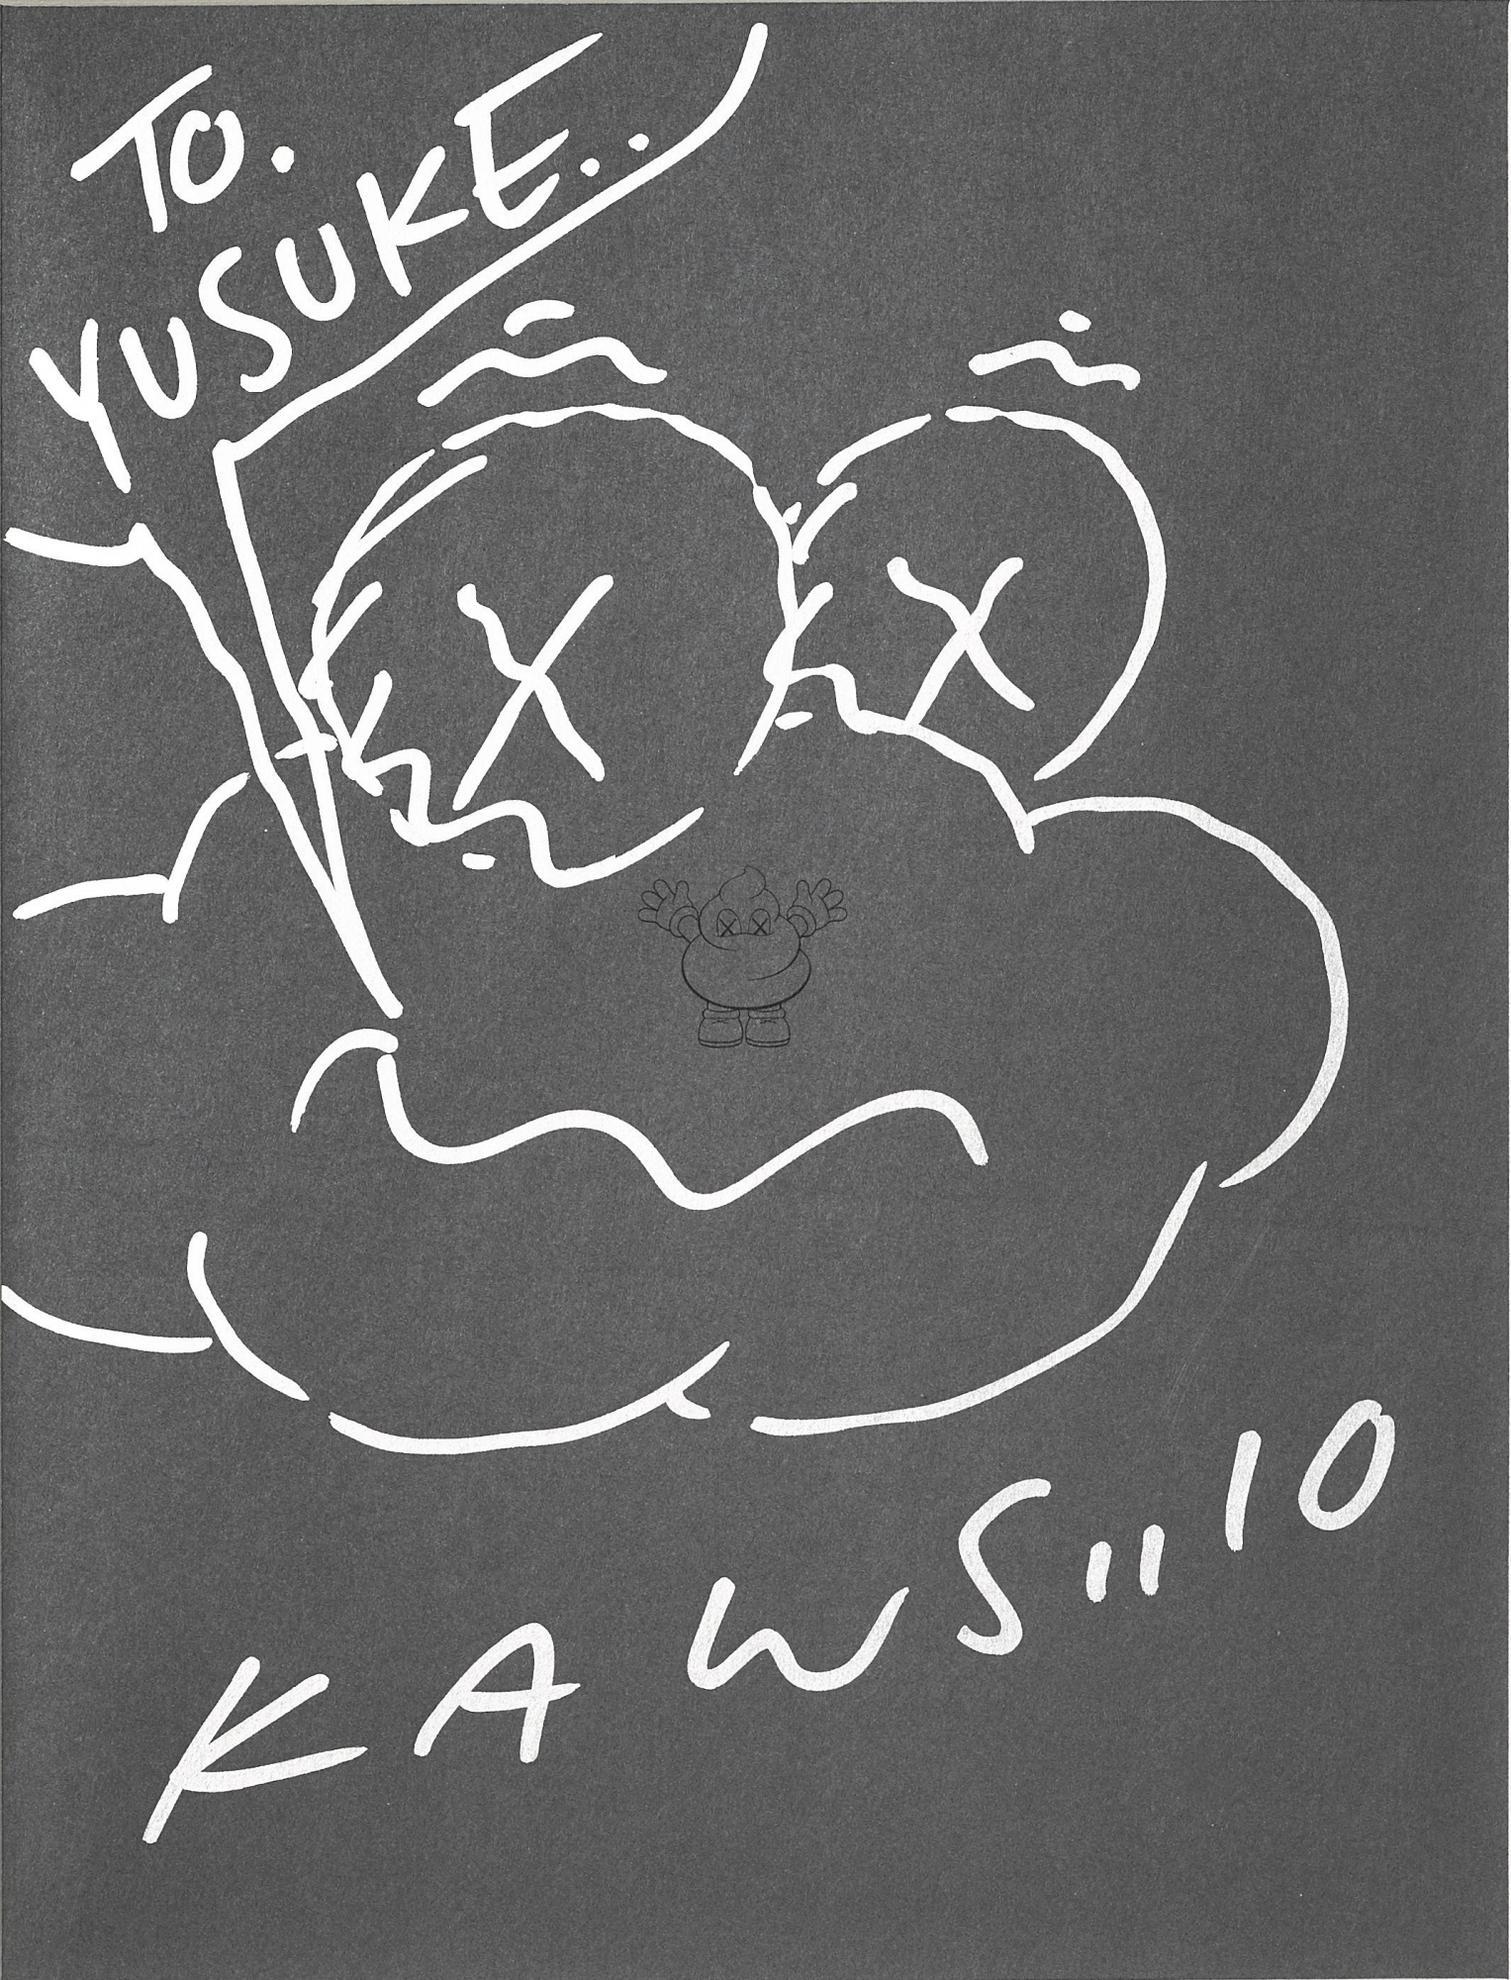 KAWS-Untitled-2010